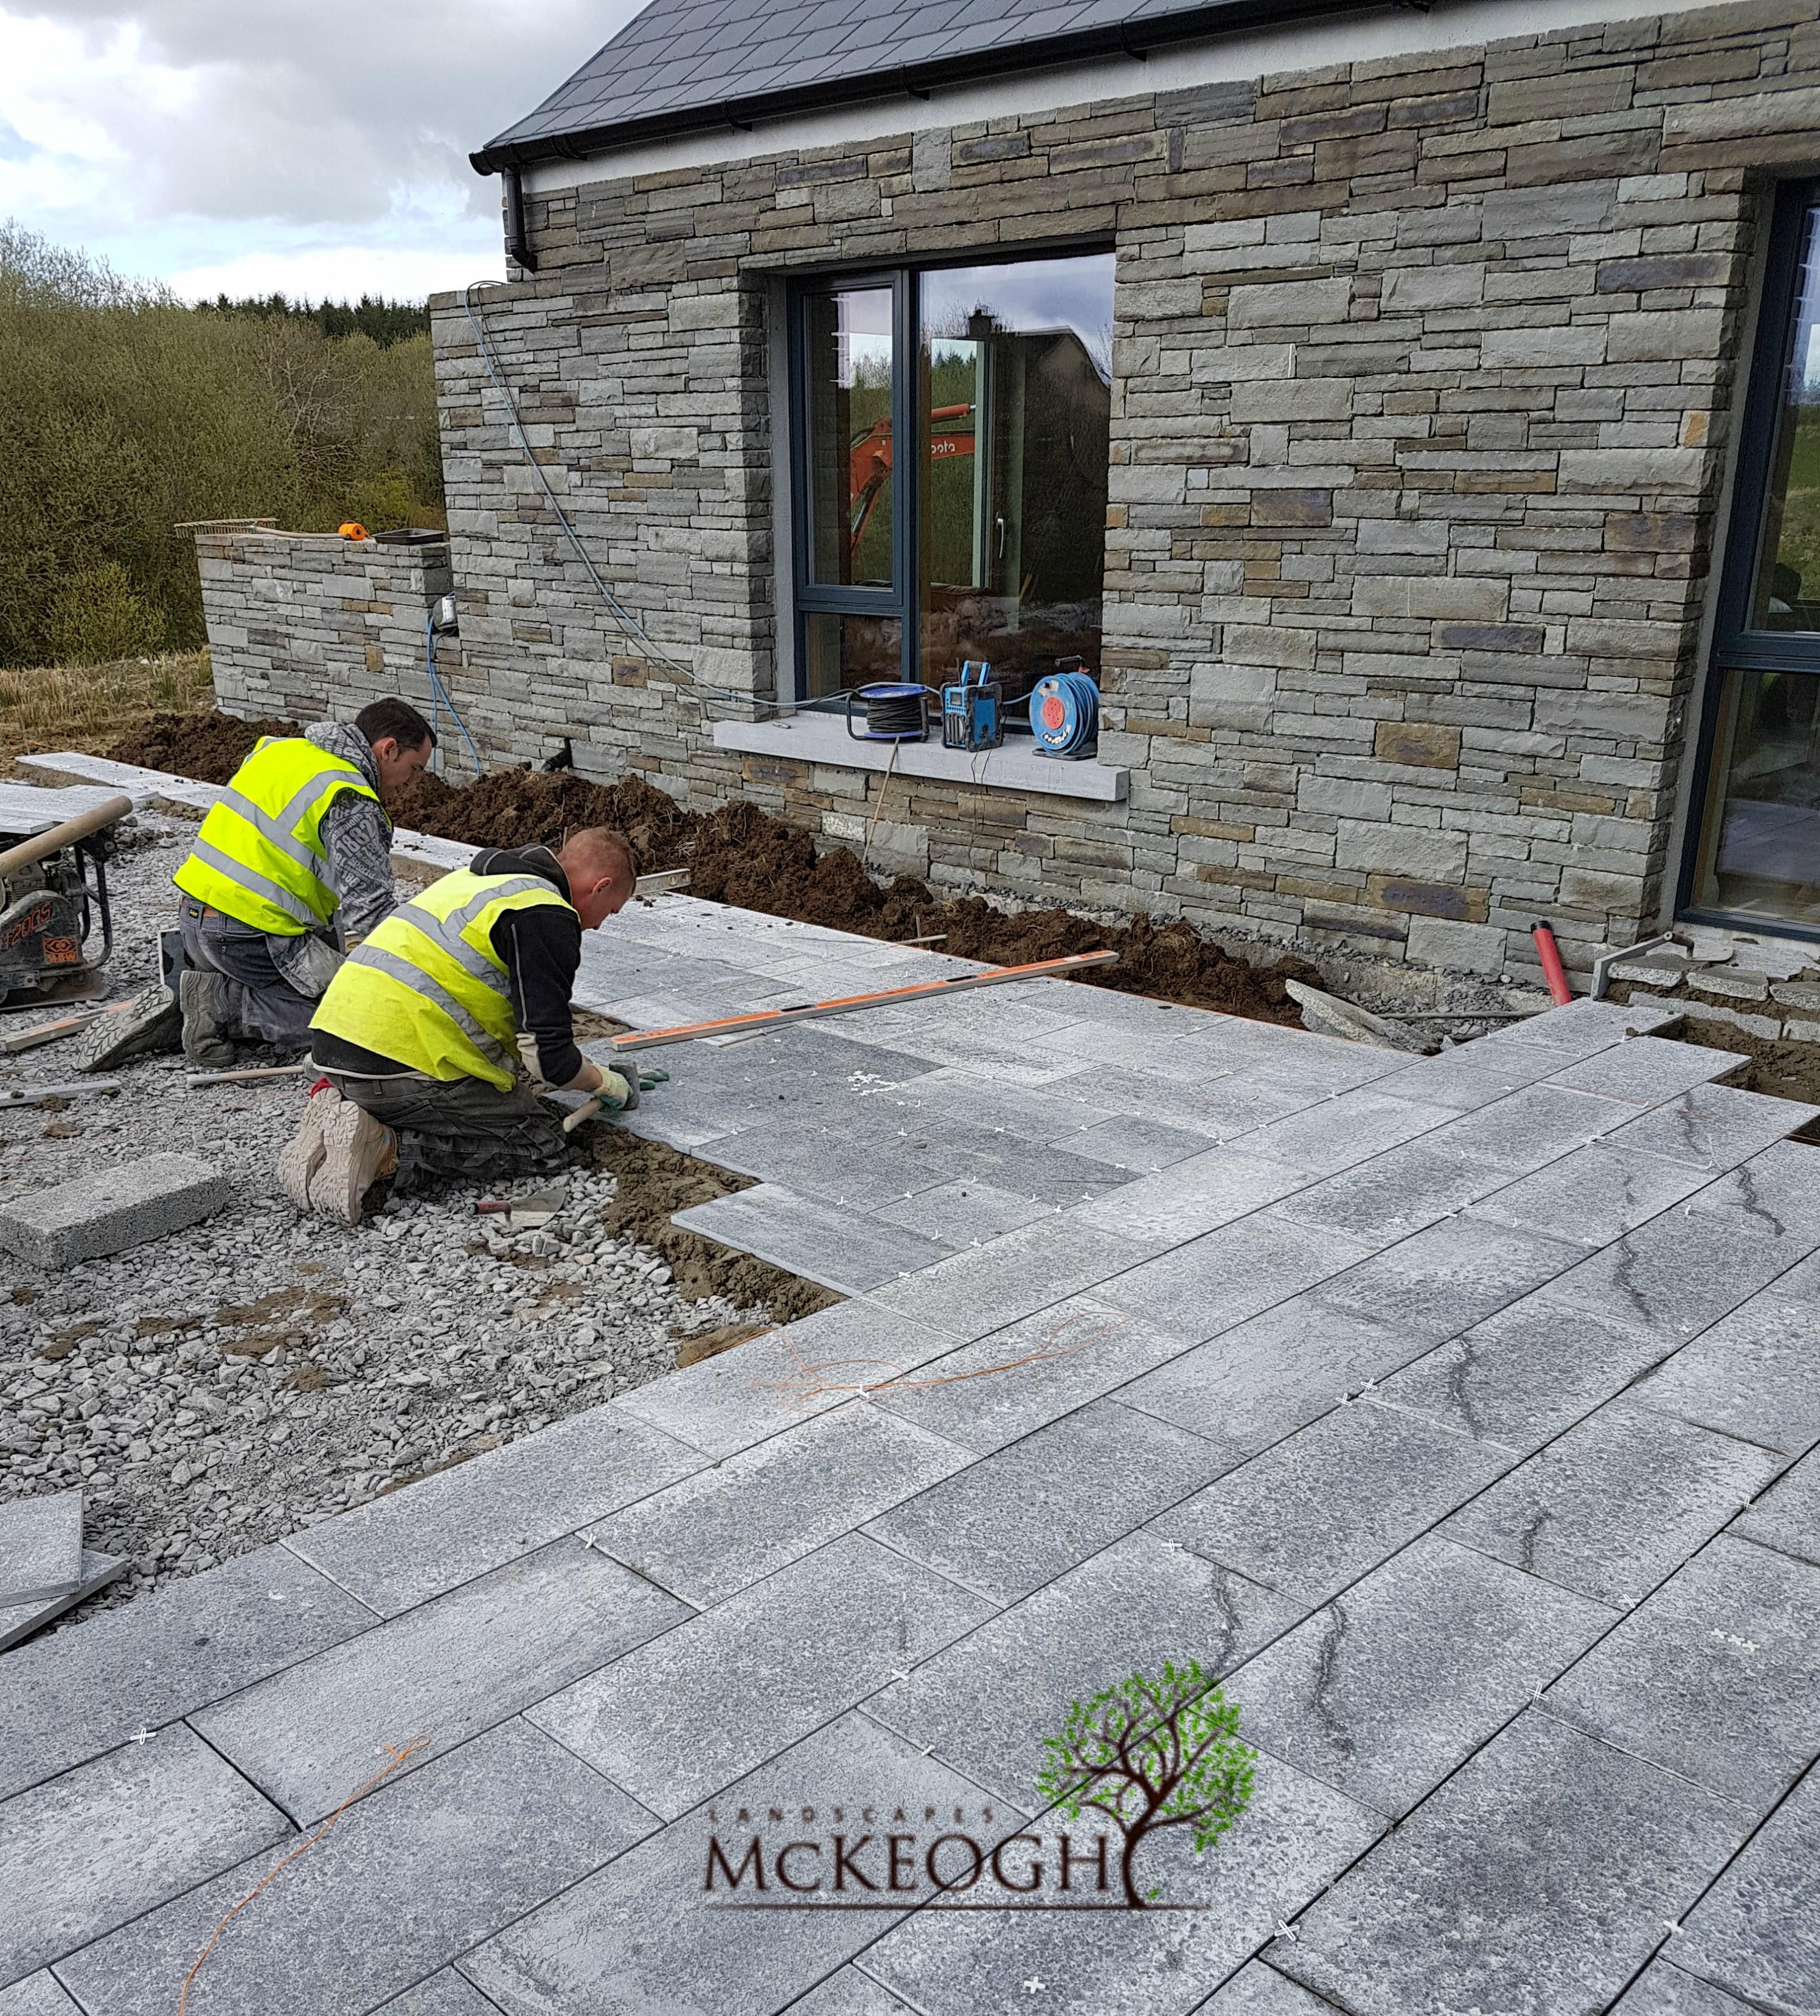 Kilkenny-limestone-paving-modern-house-clare